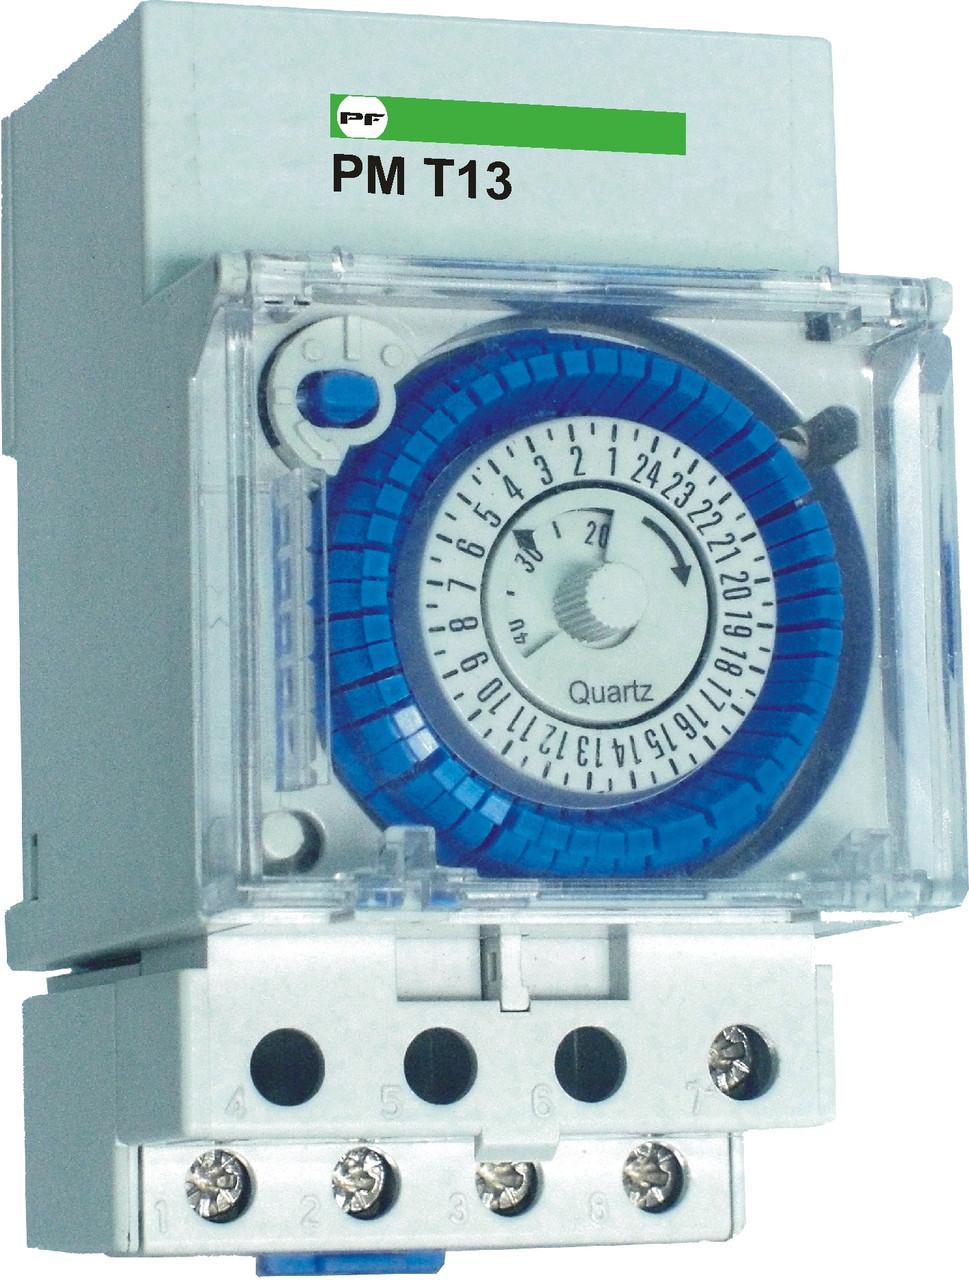 Реле модульне часу Промфактор РМ Т 13 (добове), 10А, АС230В, дискретність 30 хв